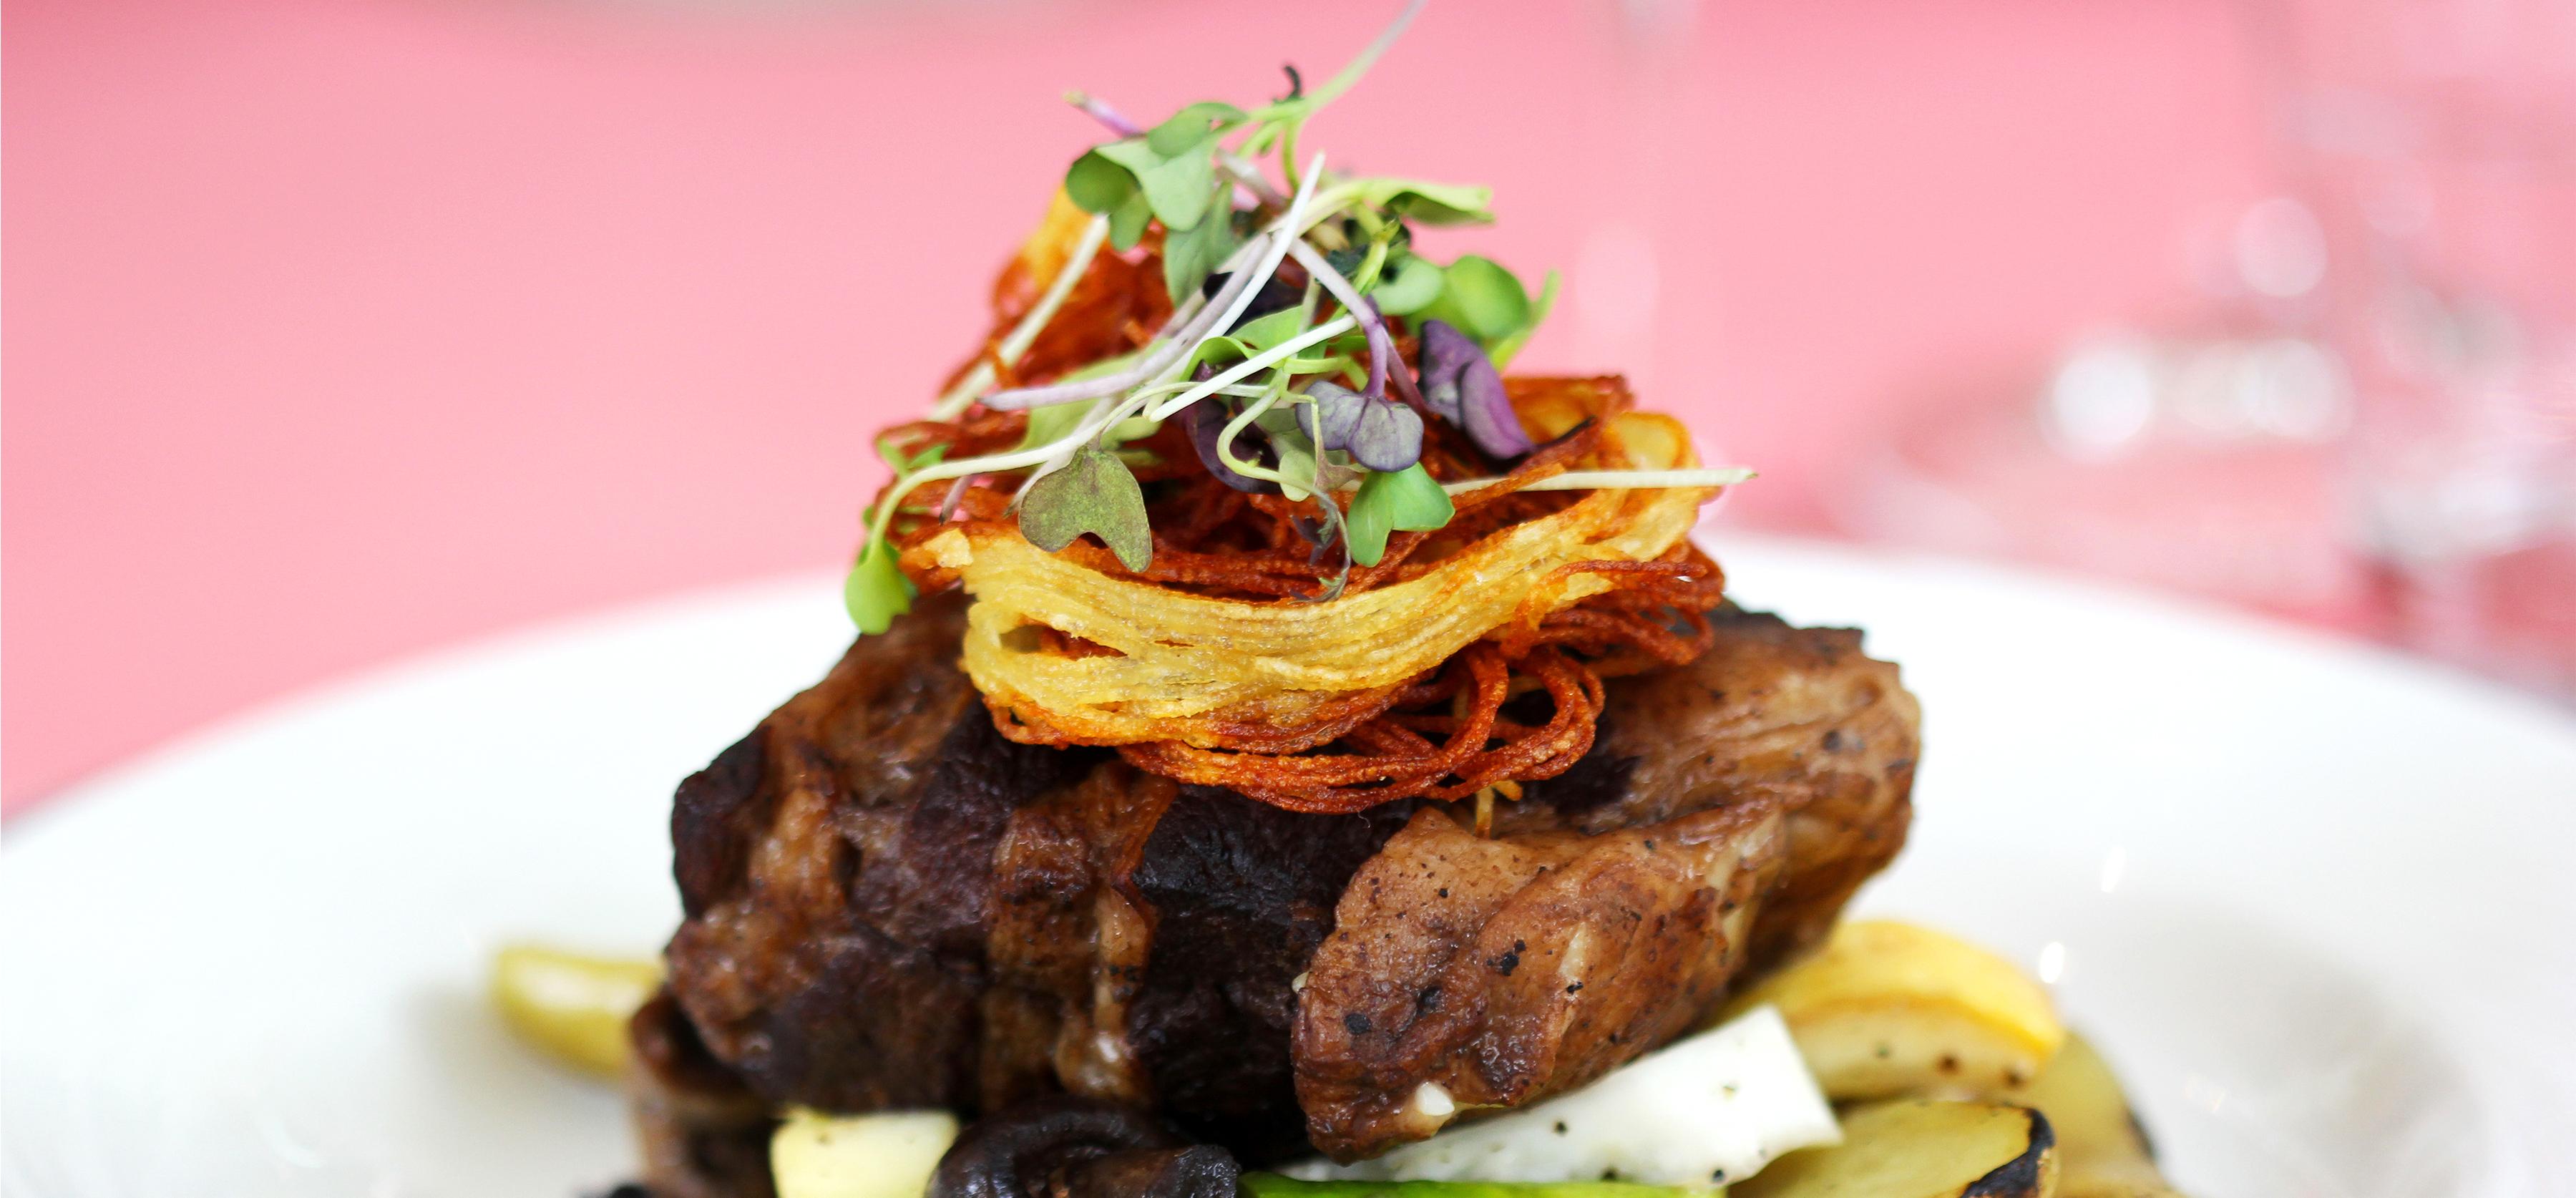 steak_potato_slide deck